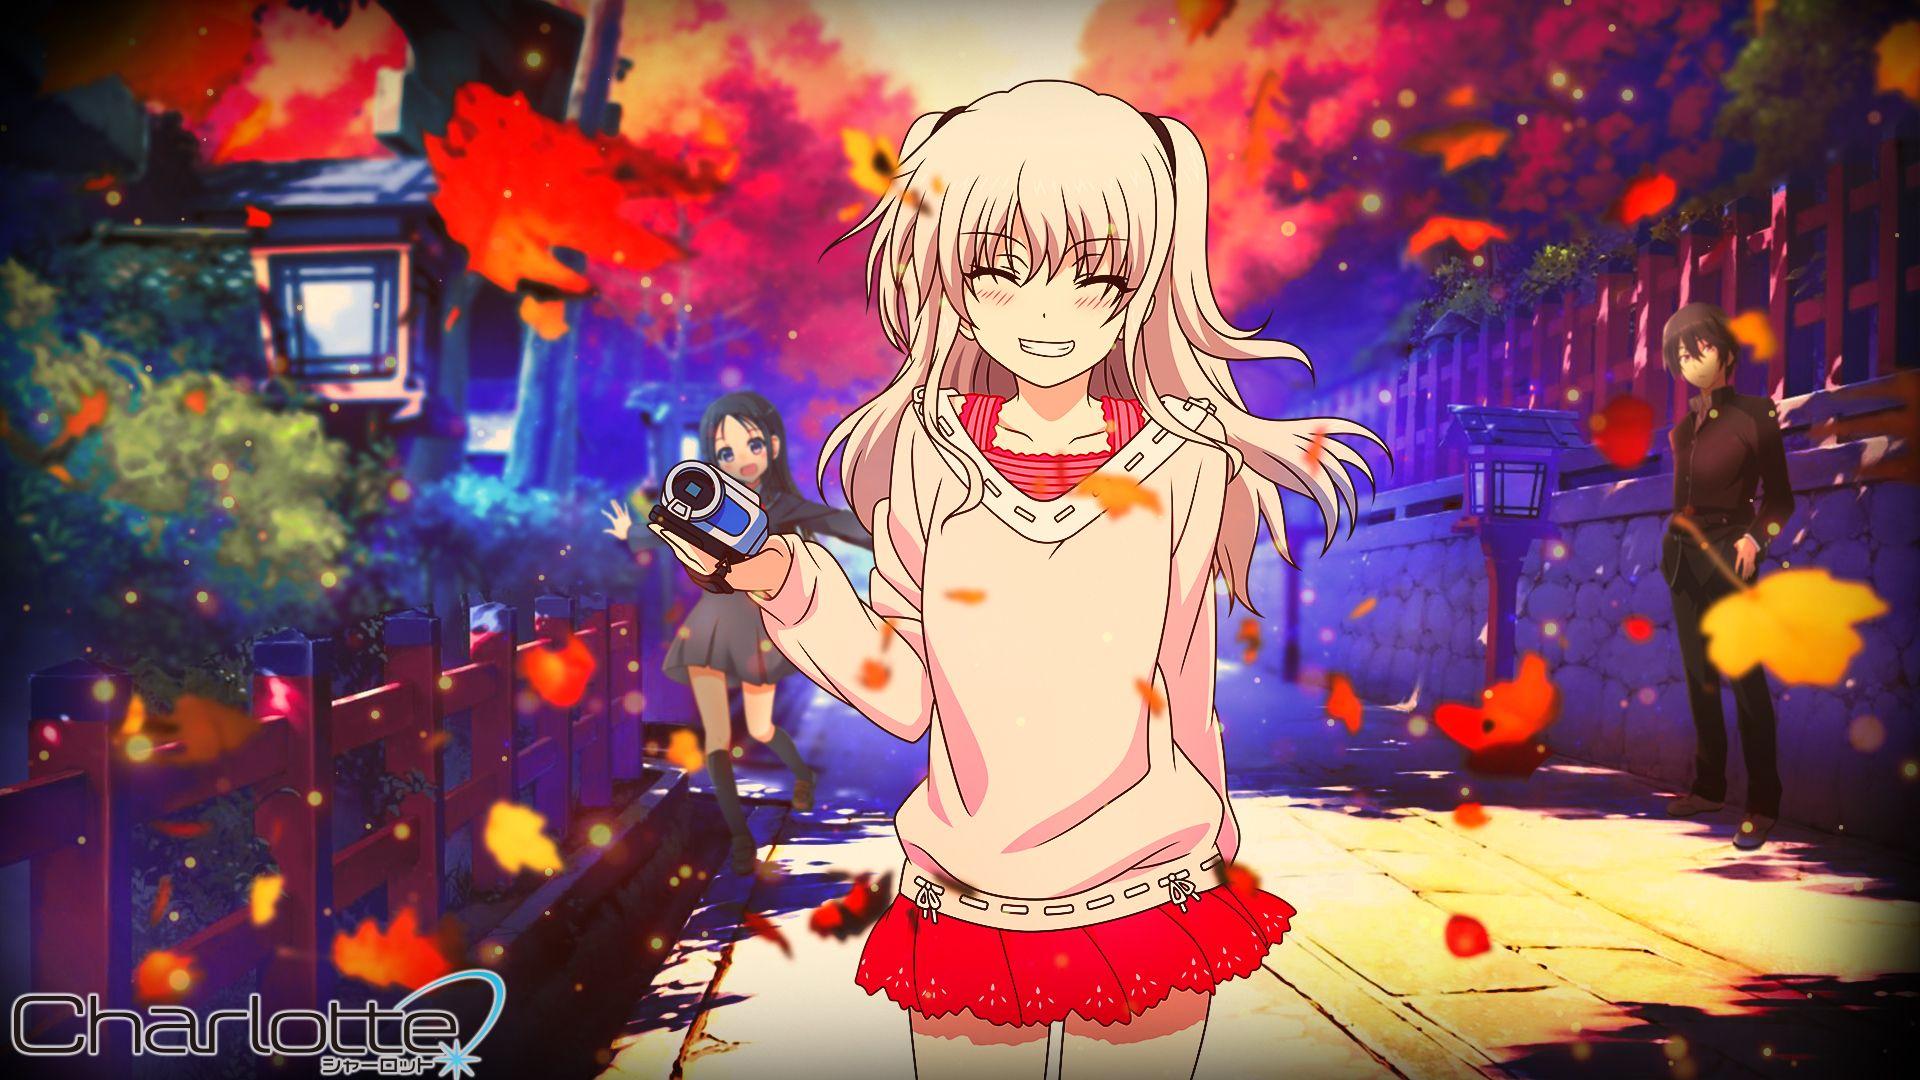 Pin On Anime Digital